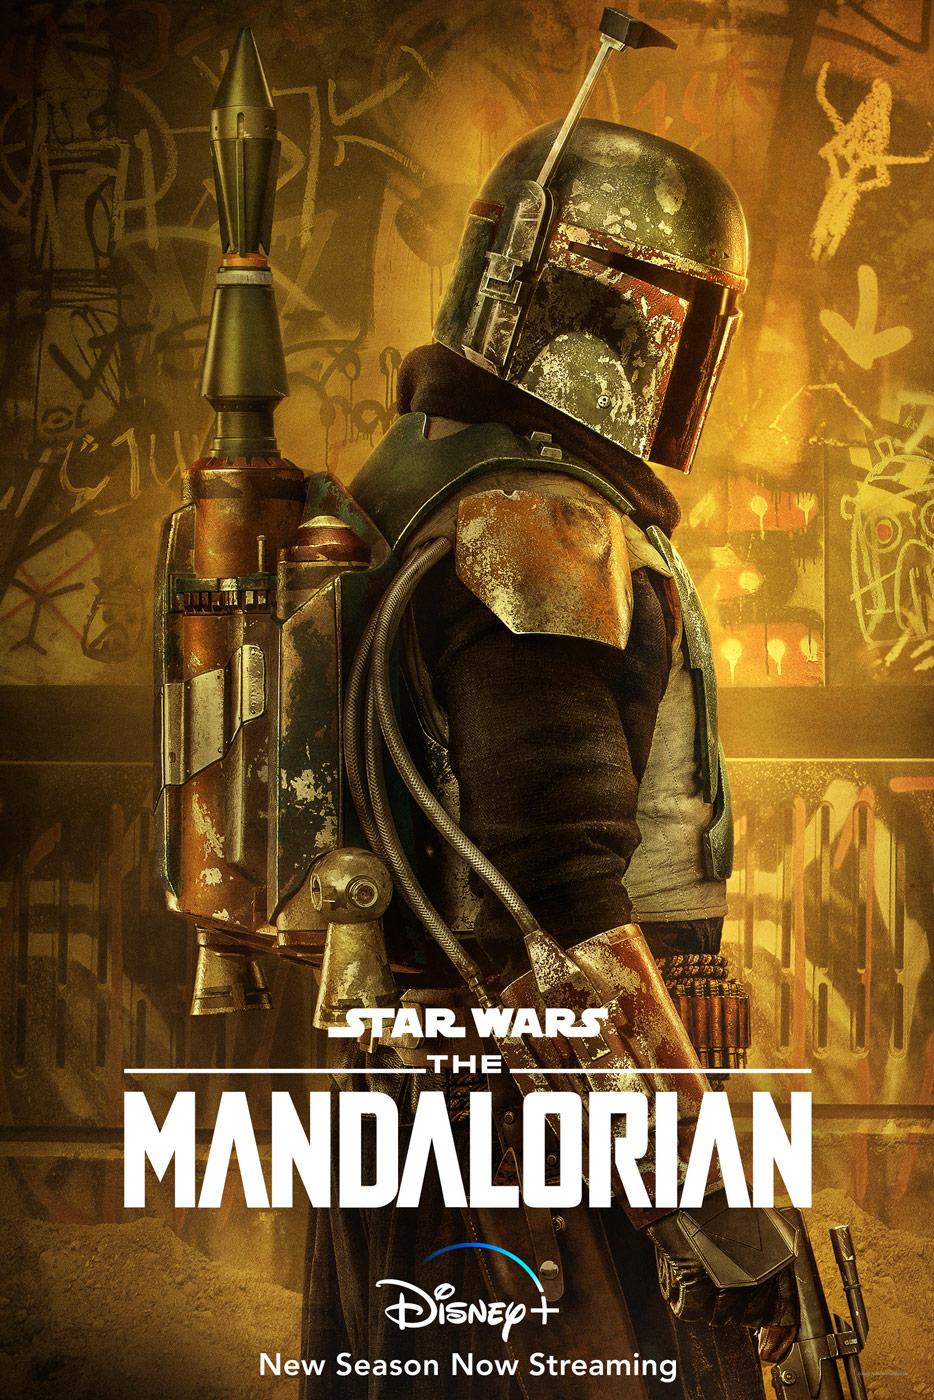 The Mandalorian Character Poster Boba Fett